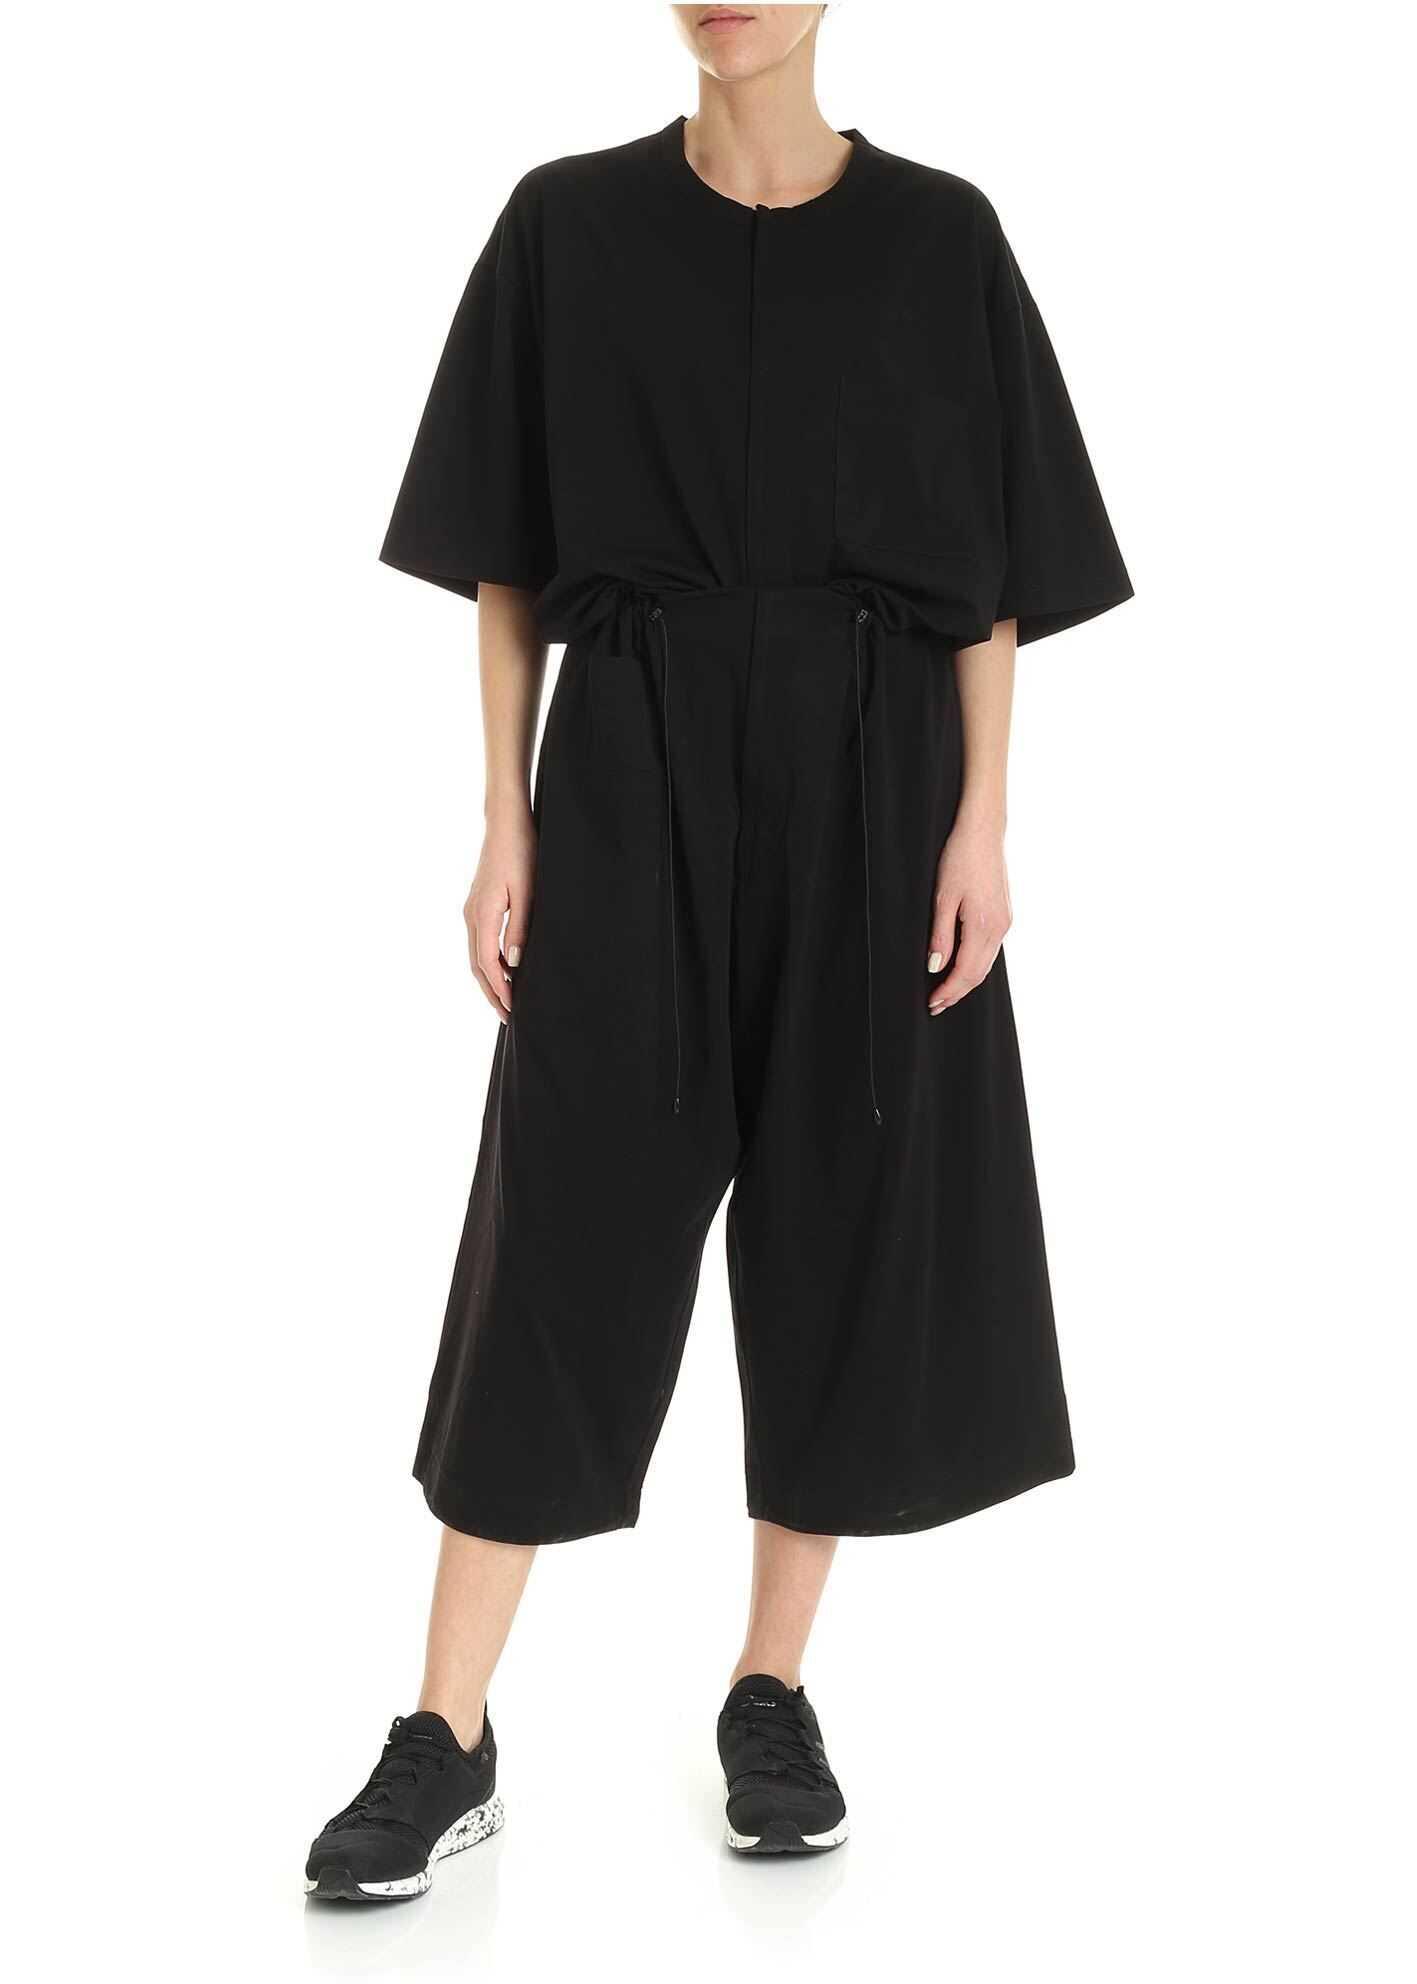 Y-3 W Trvl Jumpsuit In Black Black